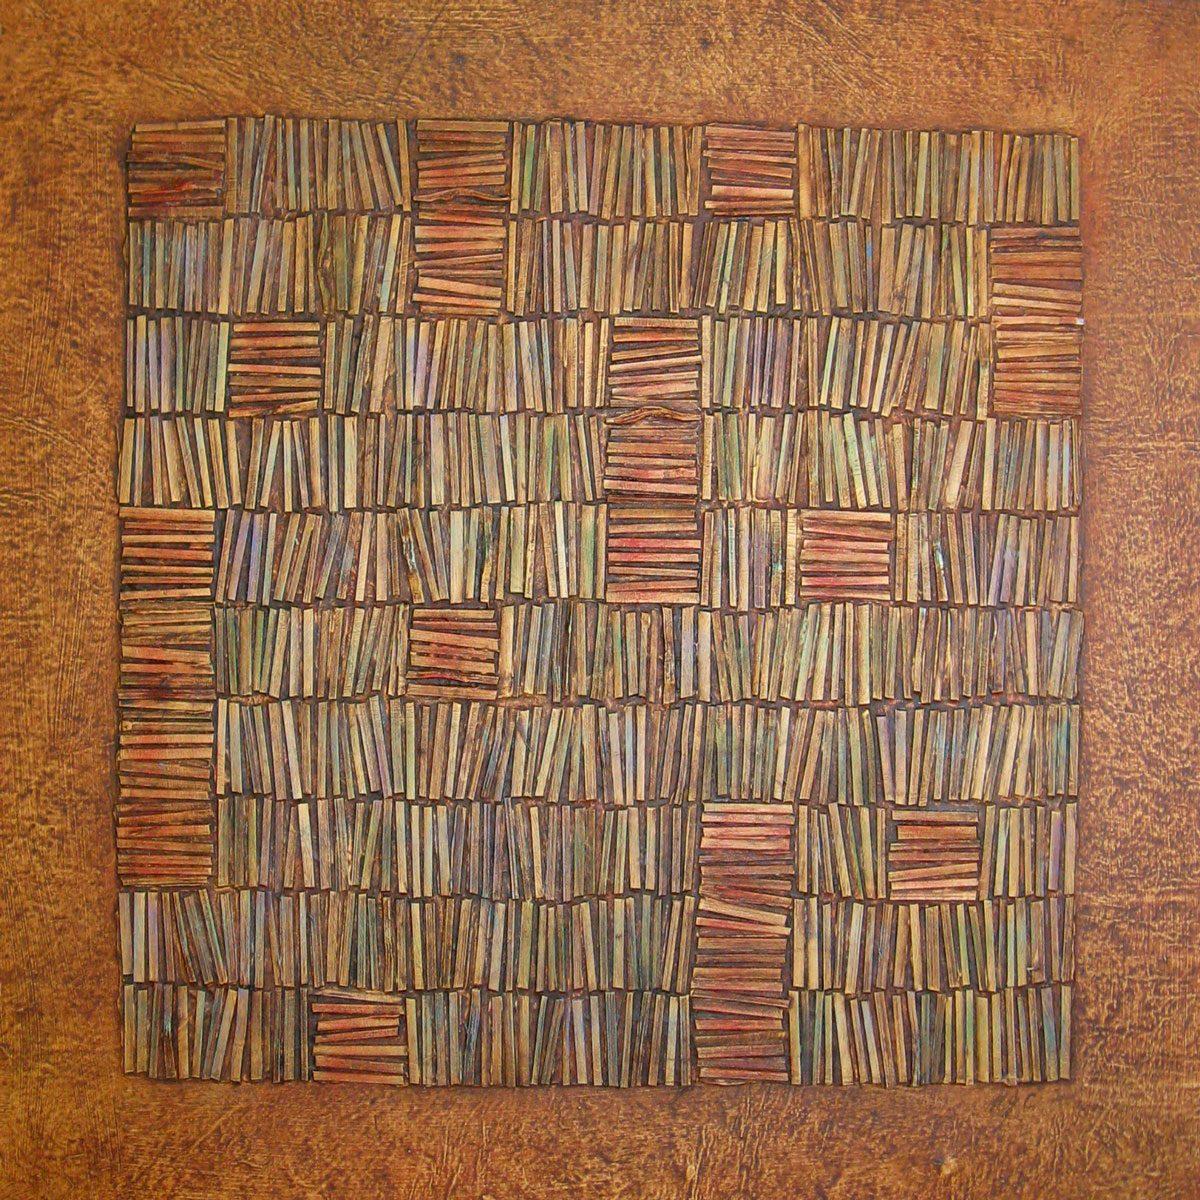 Logrythmic 4 – Heather Cowie